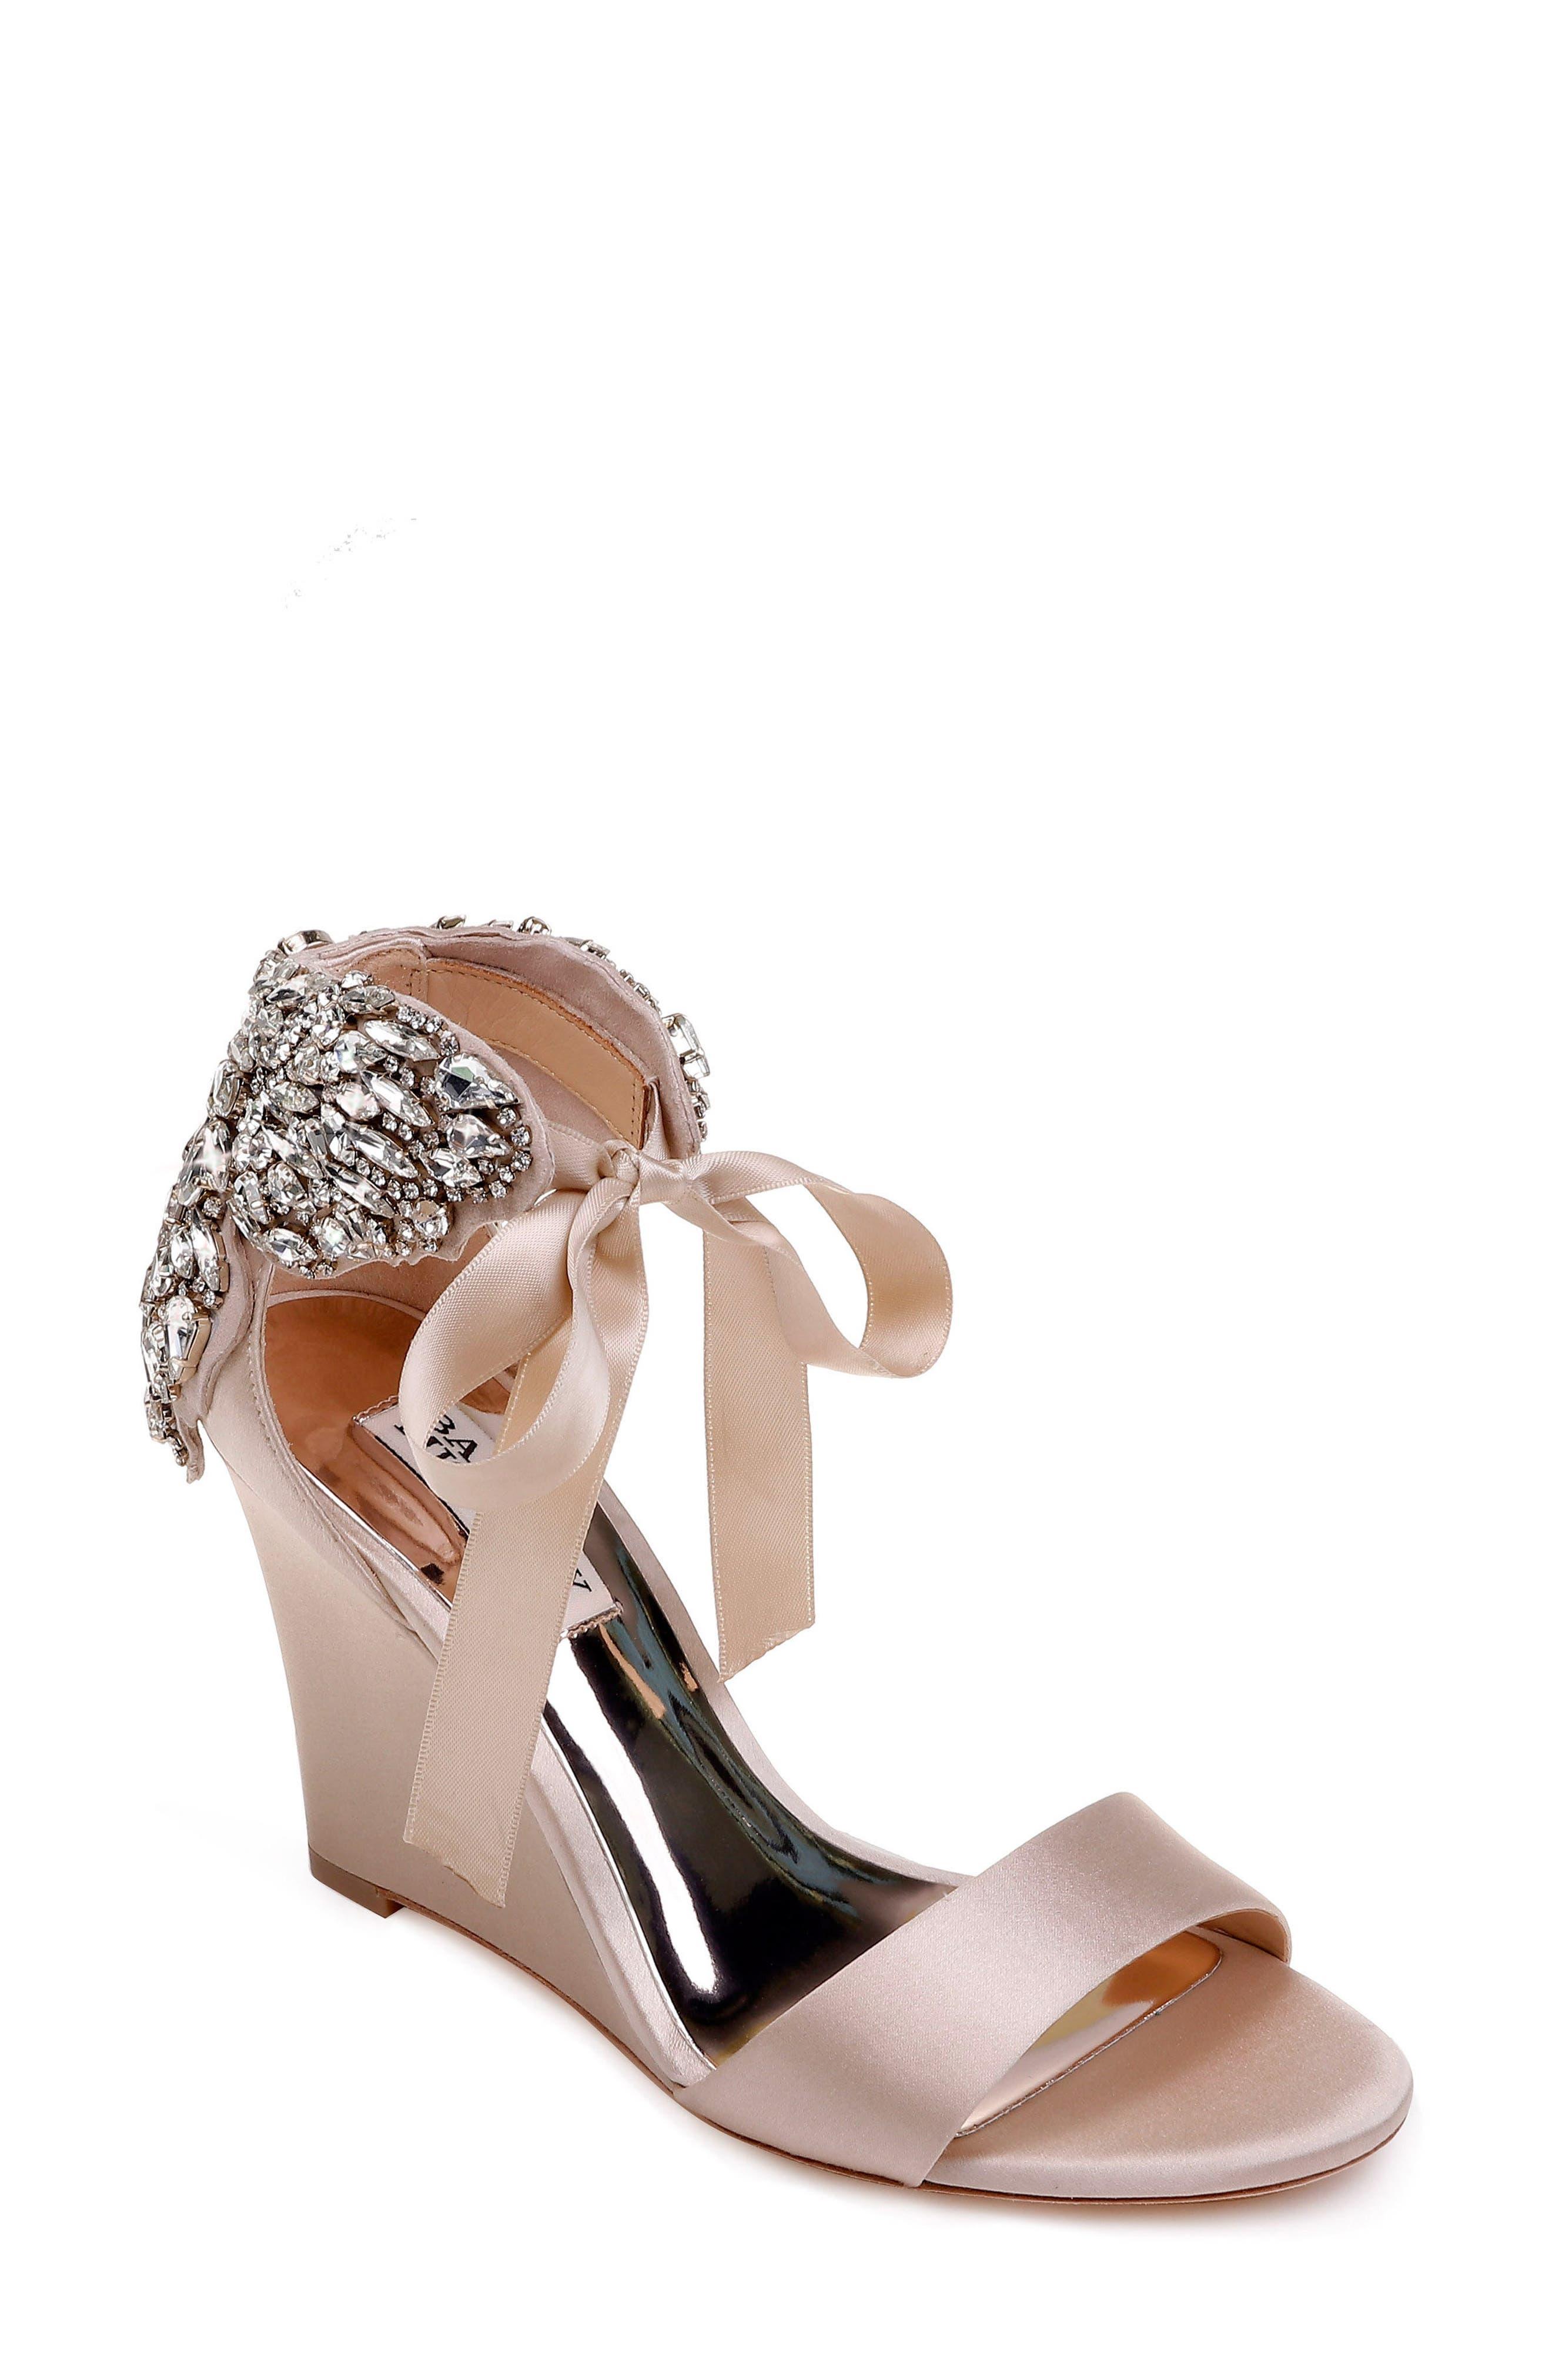 Badgley Mischka Heather Crystal Embellished Wedge (Women)